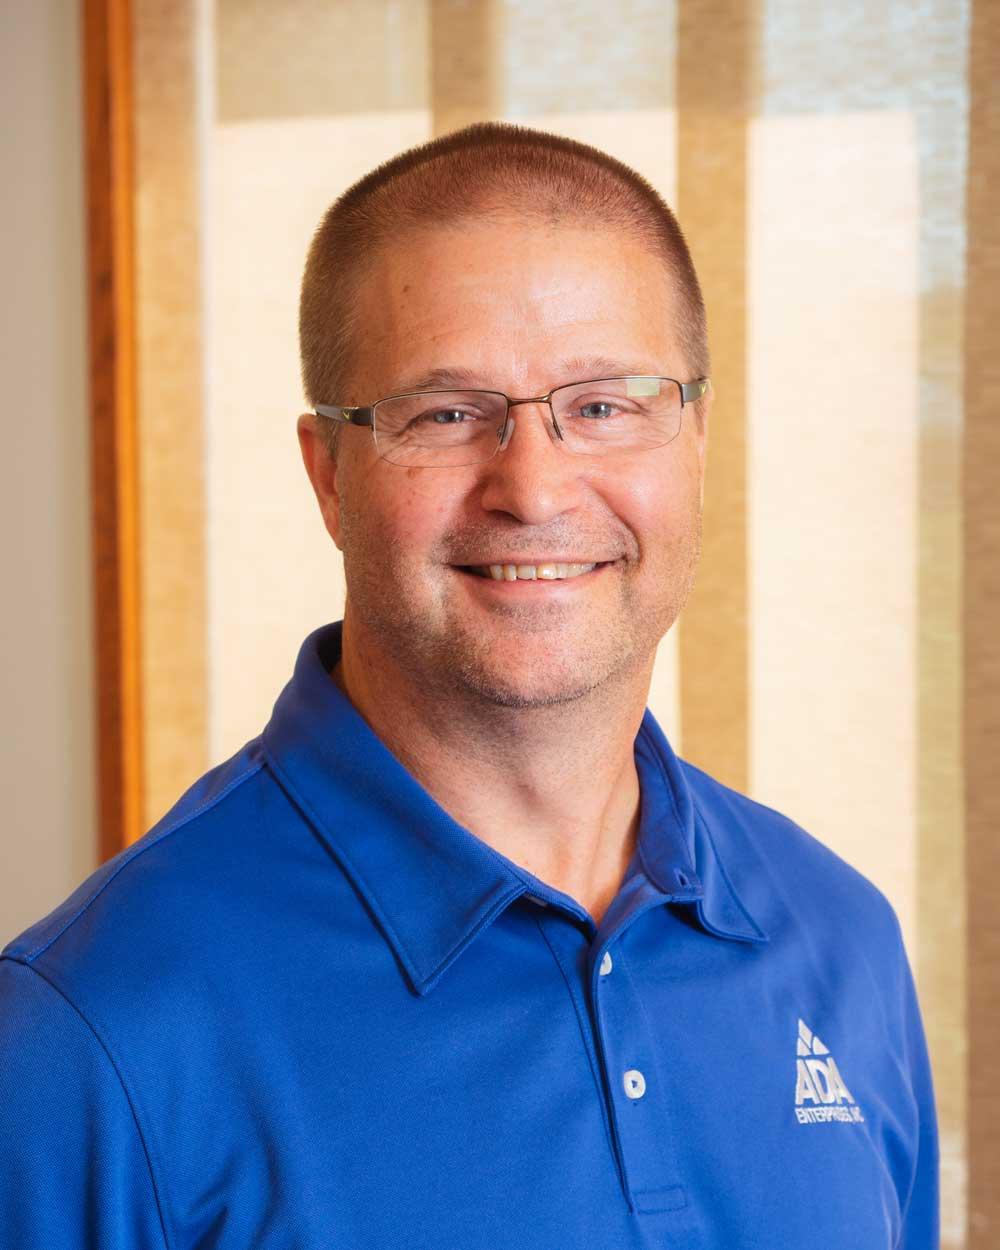 Tom Stensrud, President/CEO